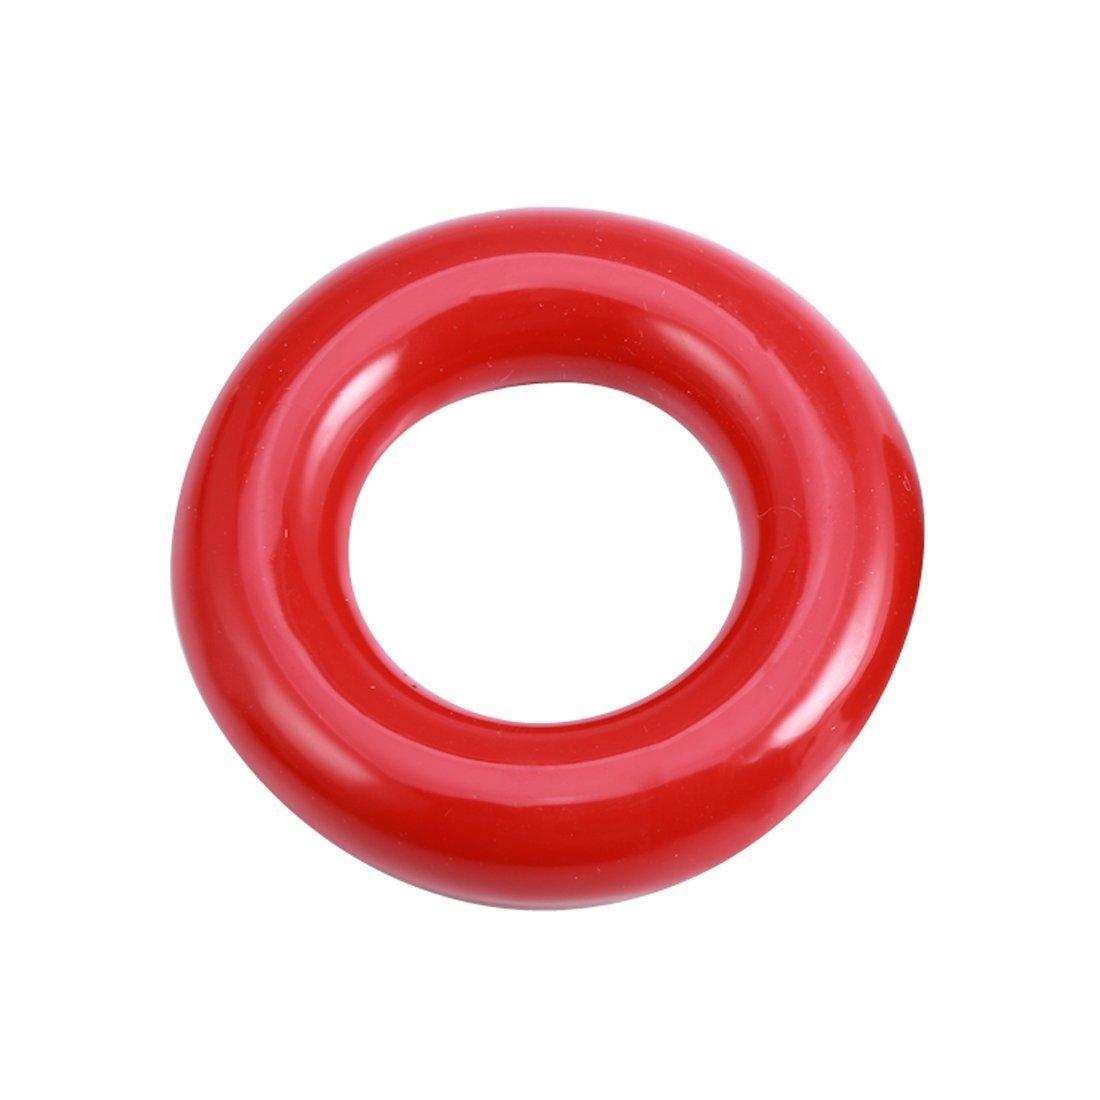 Canamite� Swing, peso rotondo per mazze da golf Golf Swing Weight donut Warm-Up Practice device, Red